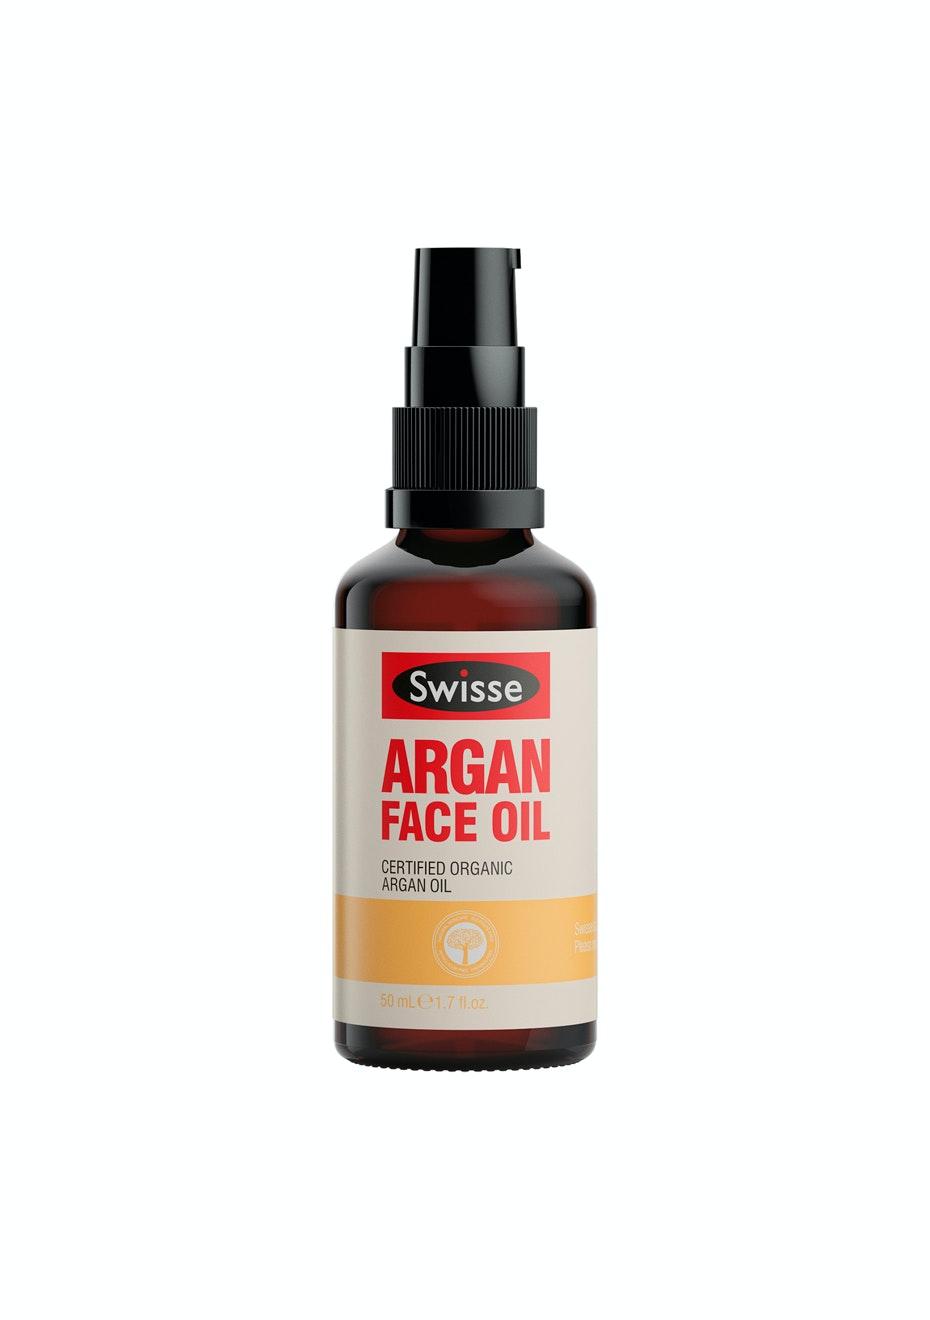 Swisse Argan Face Oil Cert. Organic 50Ml